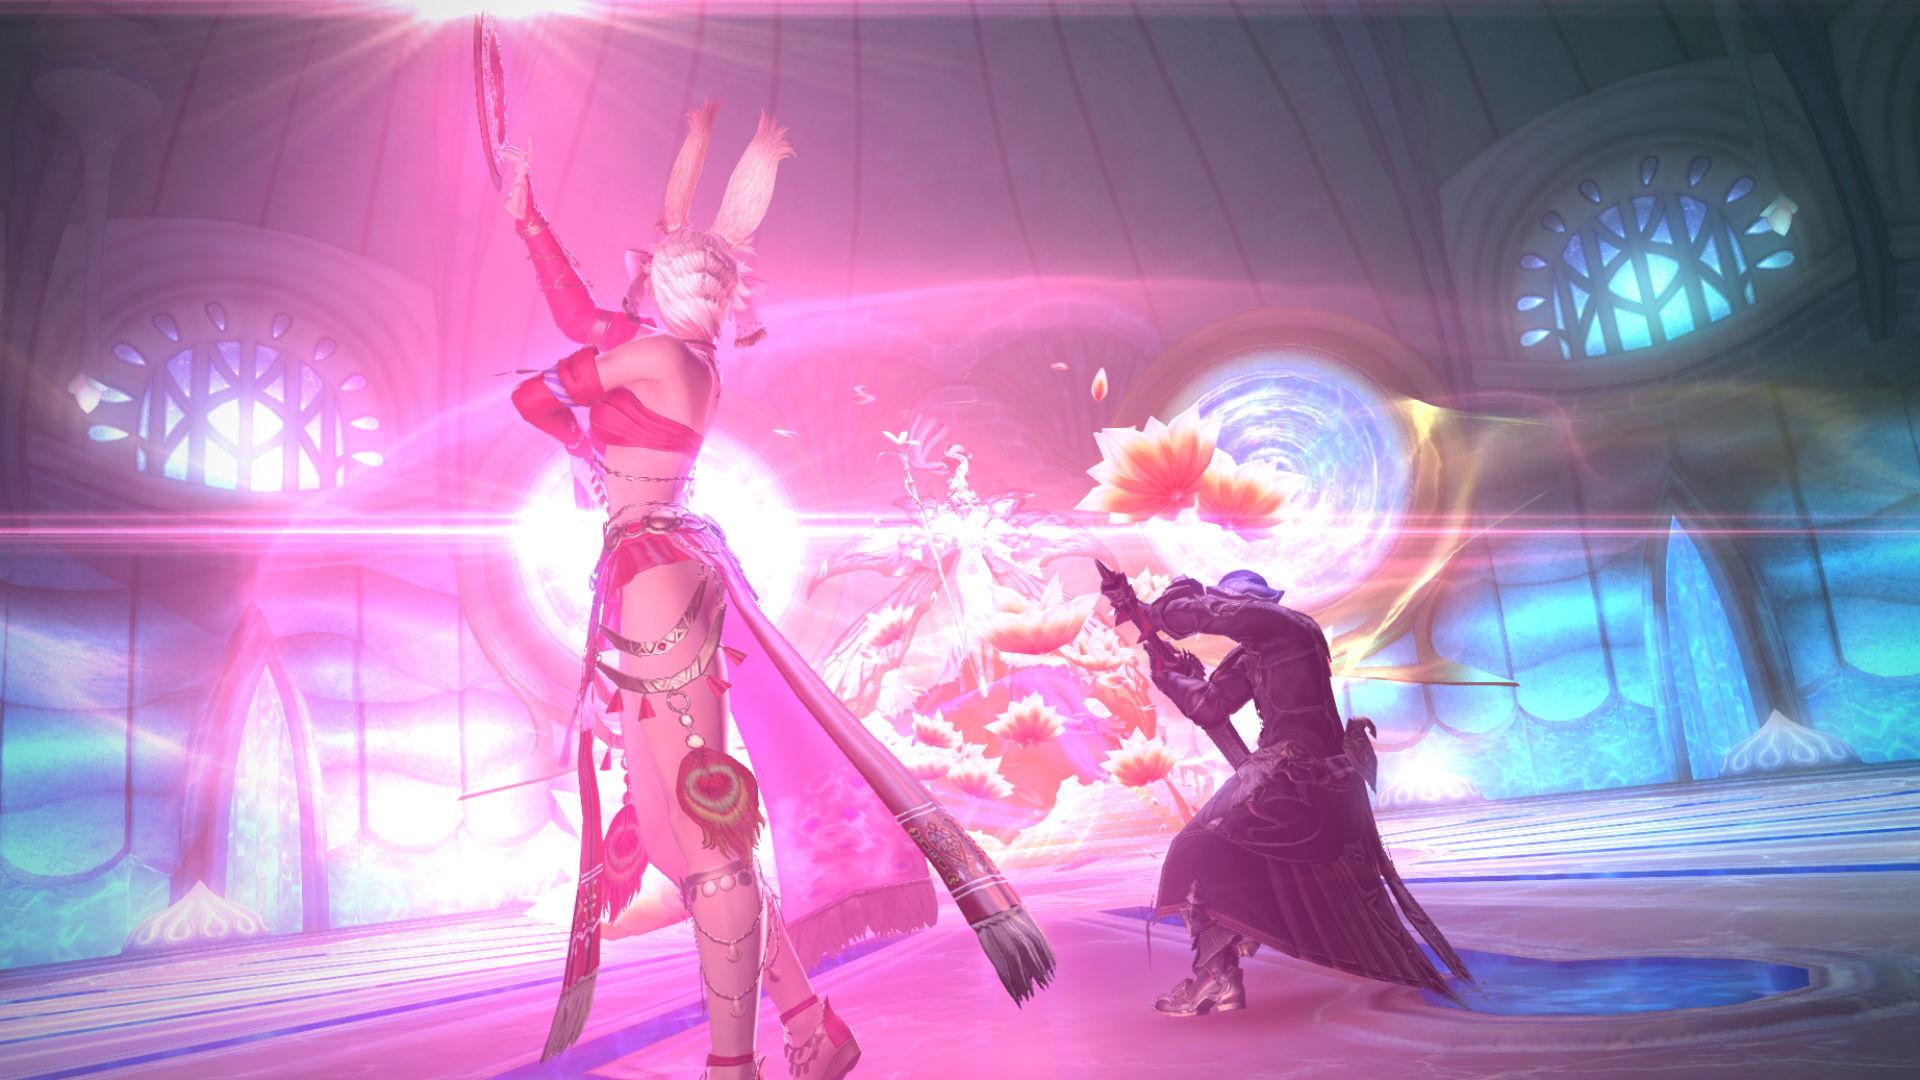 FFXIV Titania EX guide: how to conquer the FF14 Dancing Plague trial